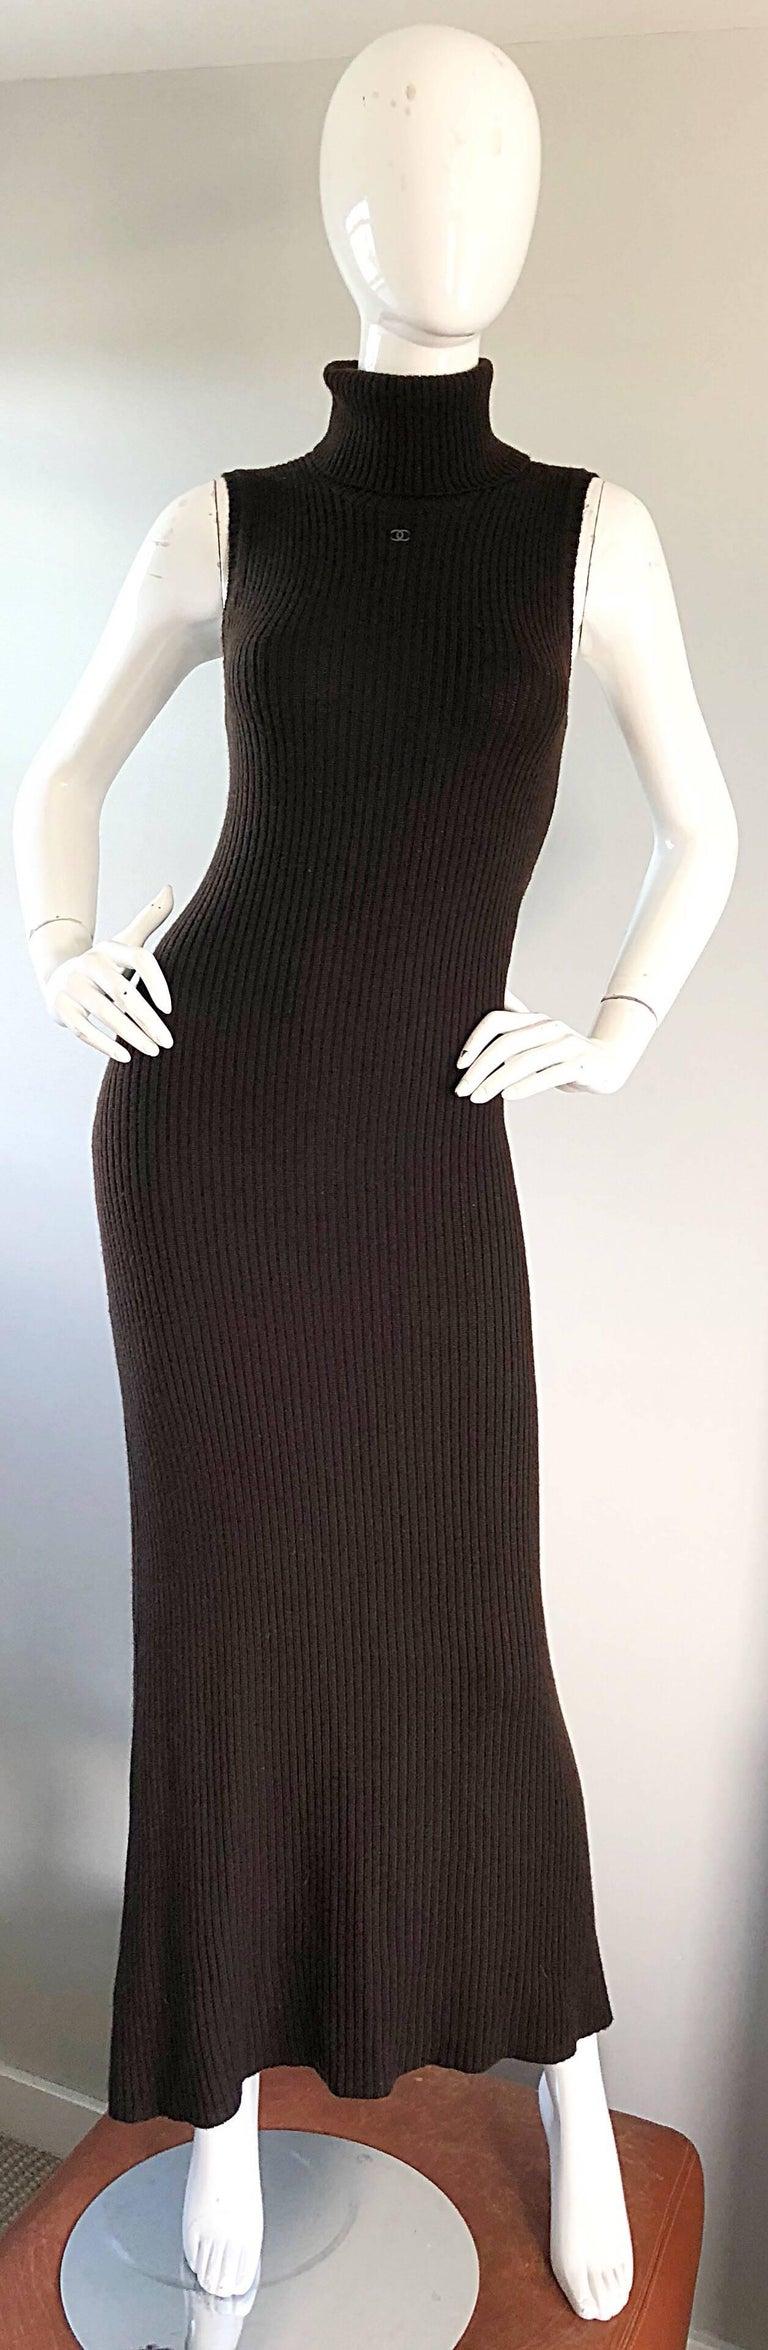 Chanel Vintage 99A Espresso Brown Cashmere Turtleneck 1990s 90s Sweater Dress 9